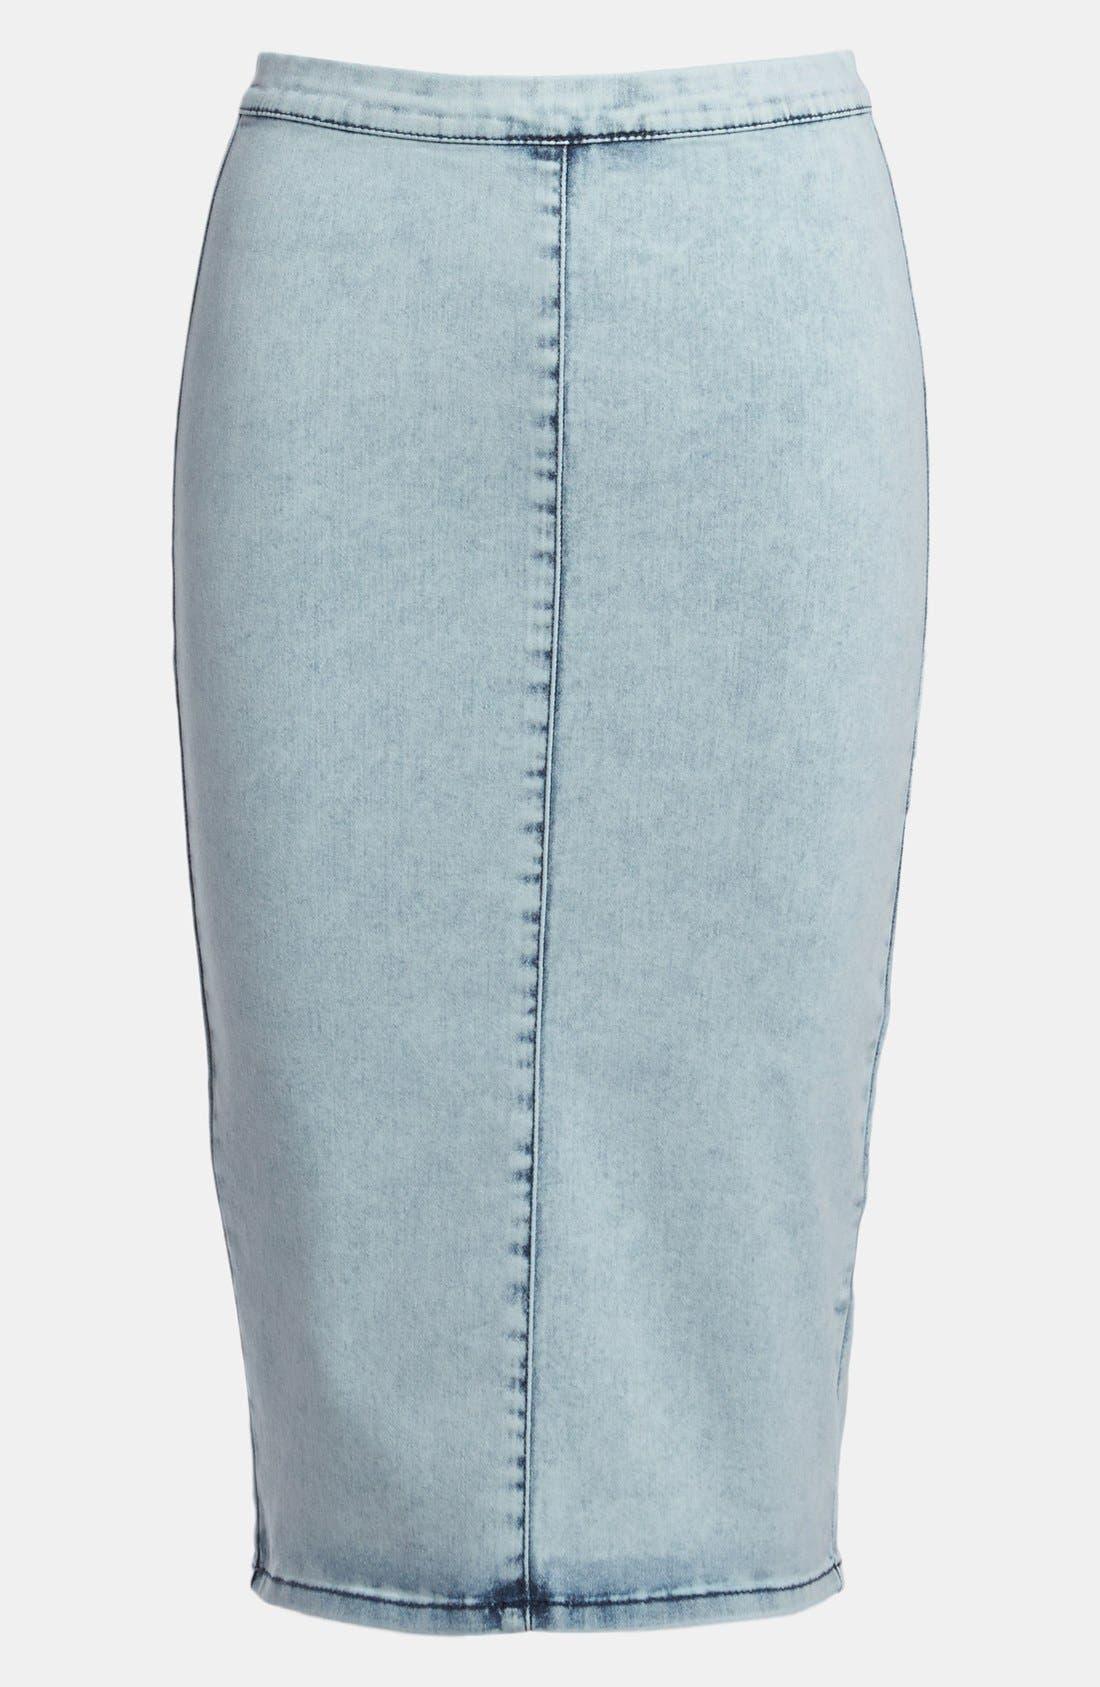 Main Image - Topshop 'Joni' Acid Wash Denim Pencil Skirt